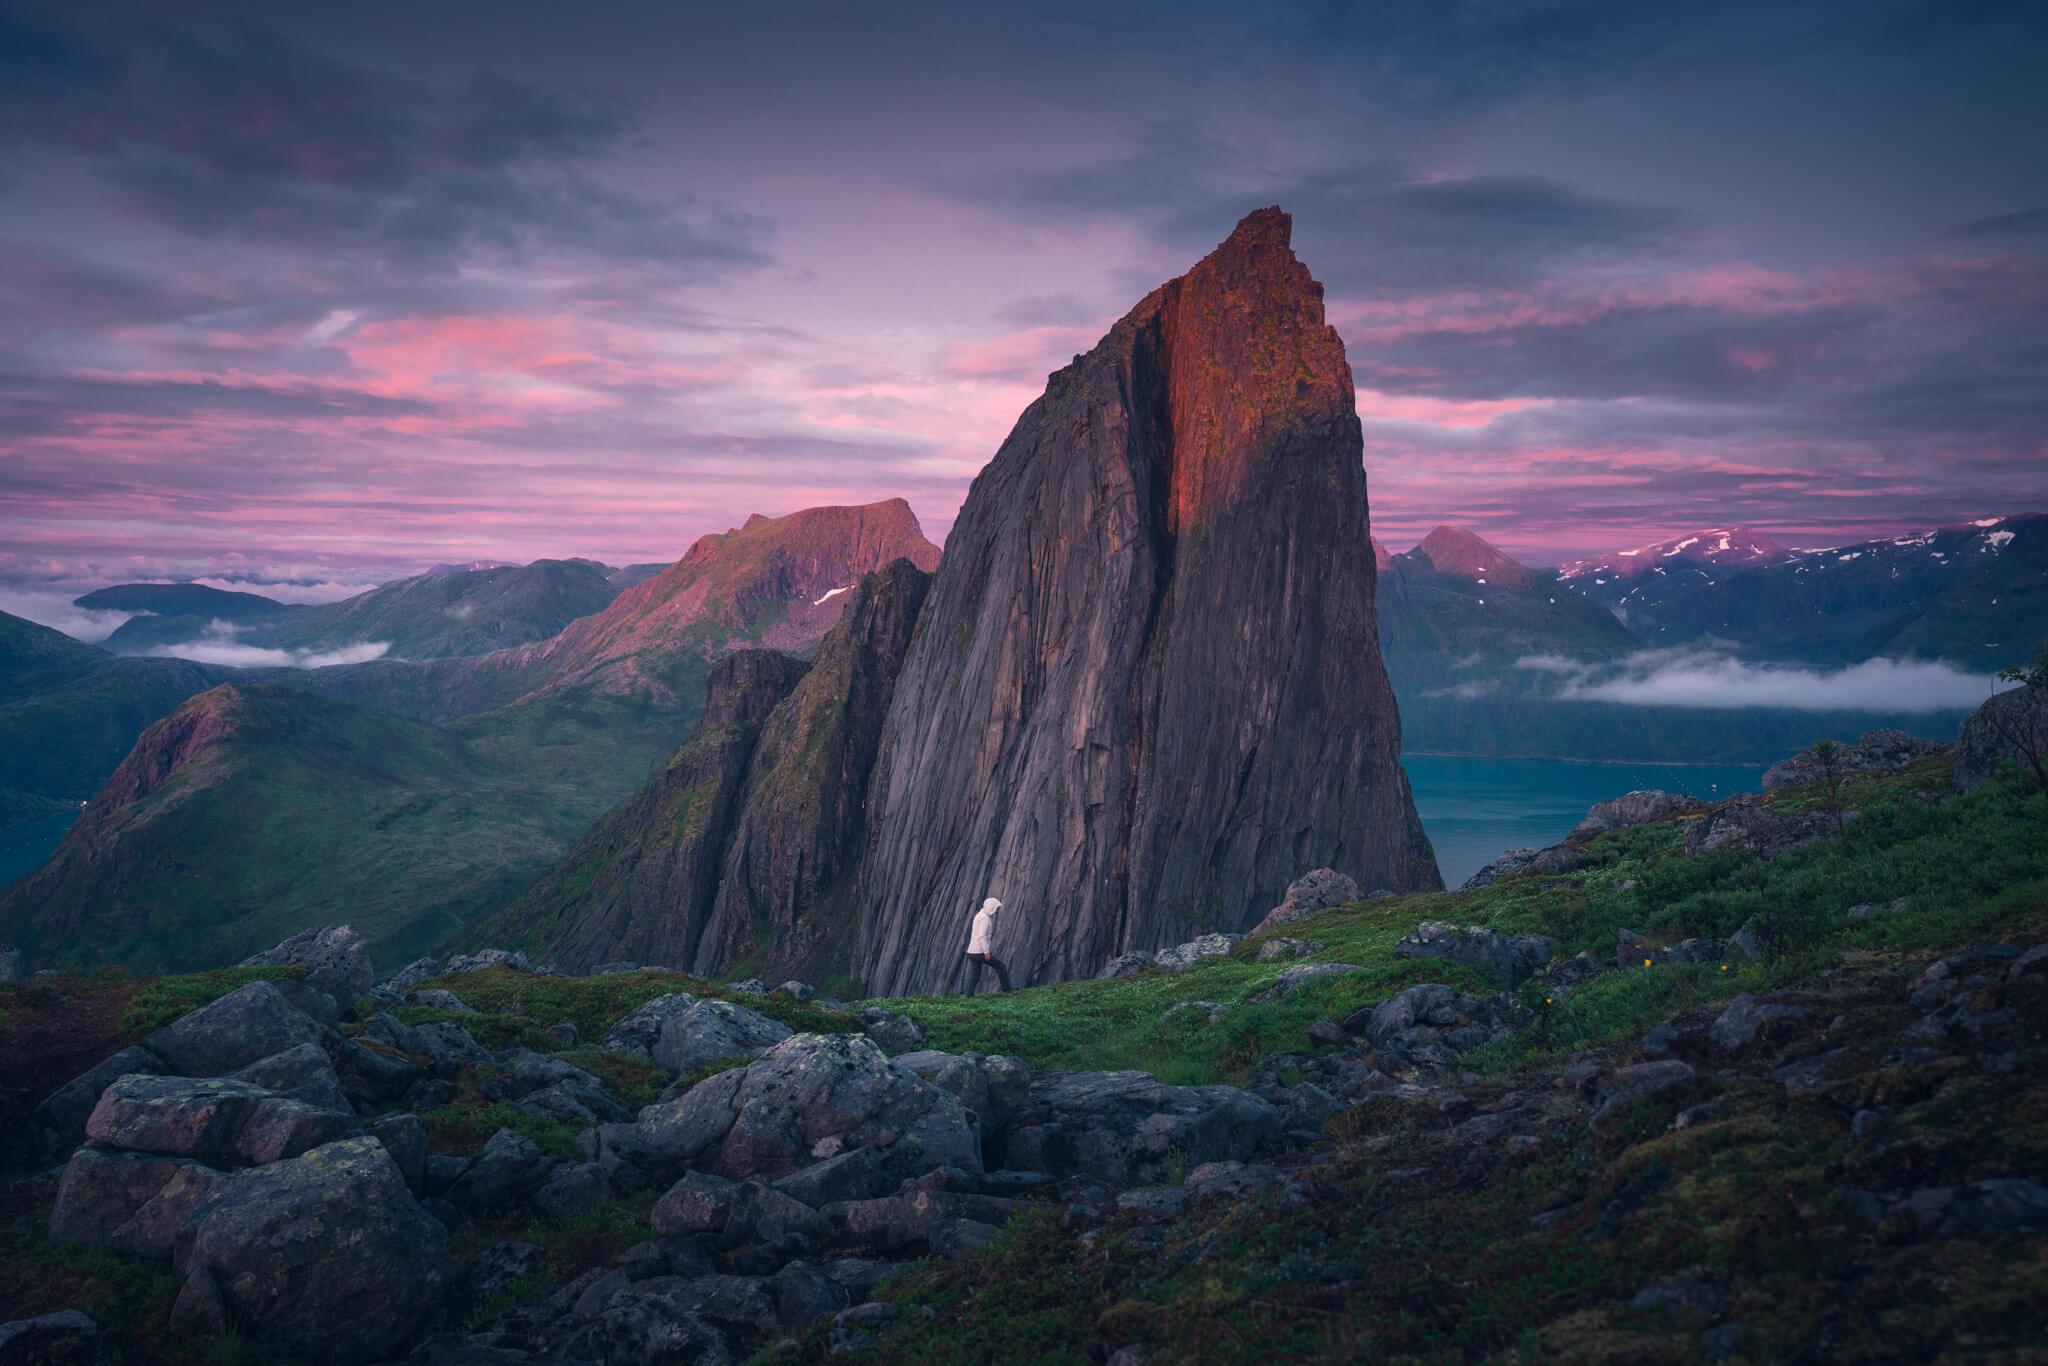 Sunset light hitting Segla mountain in Senja